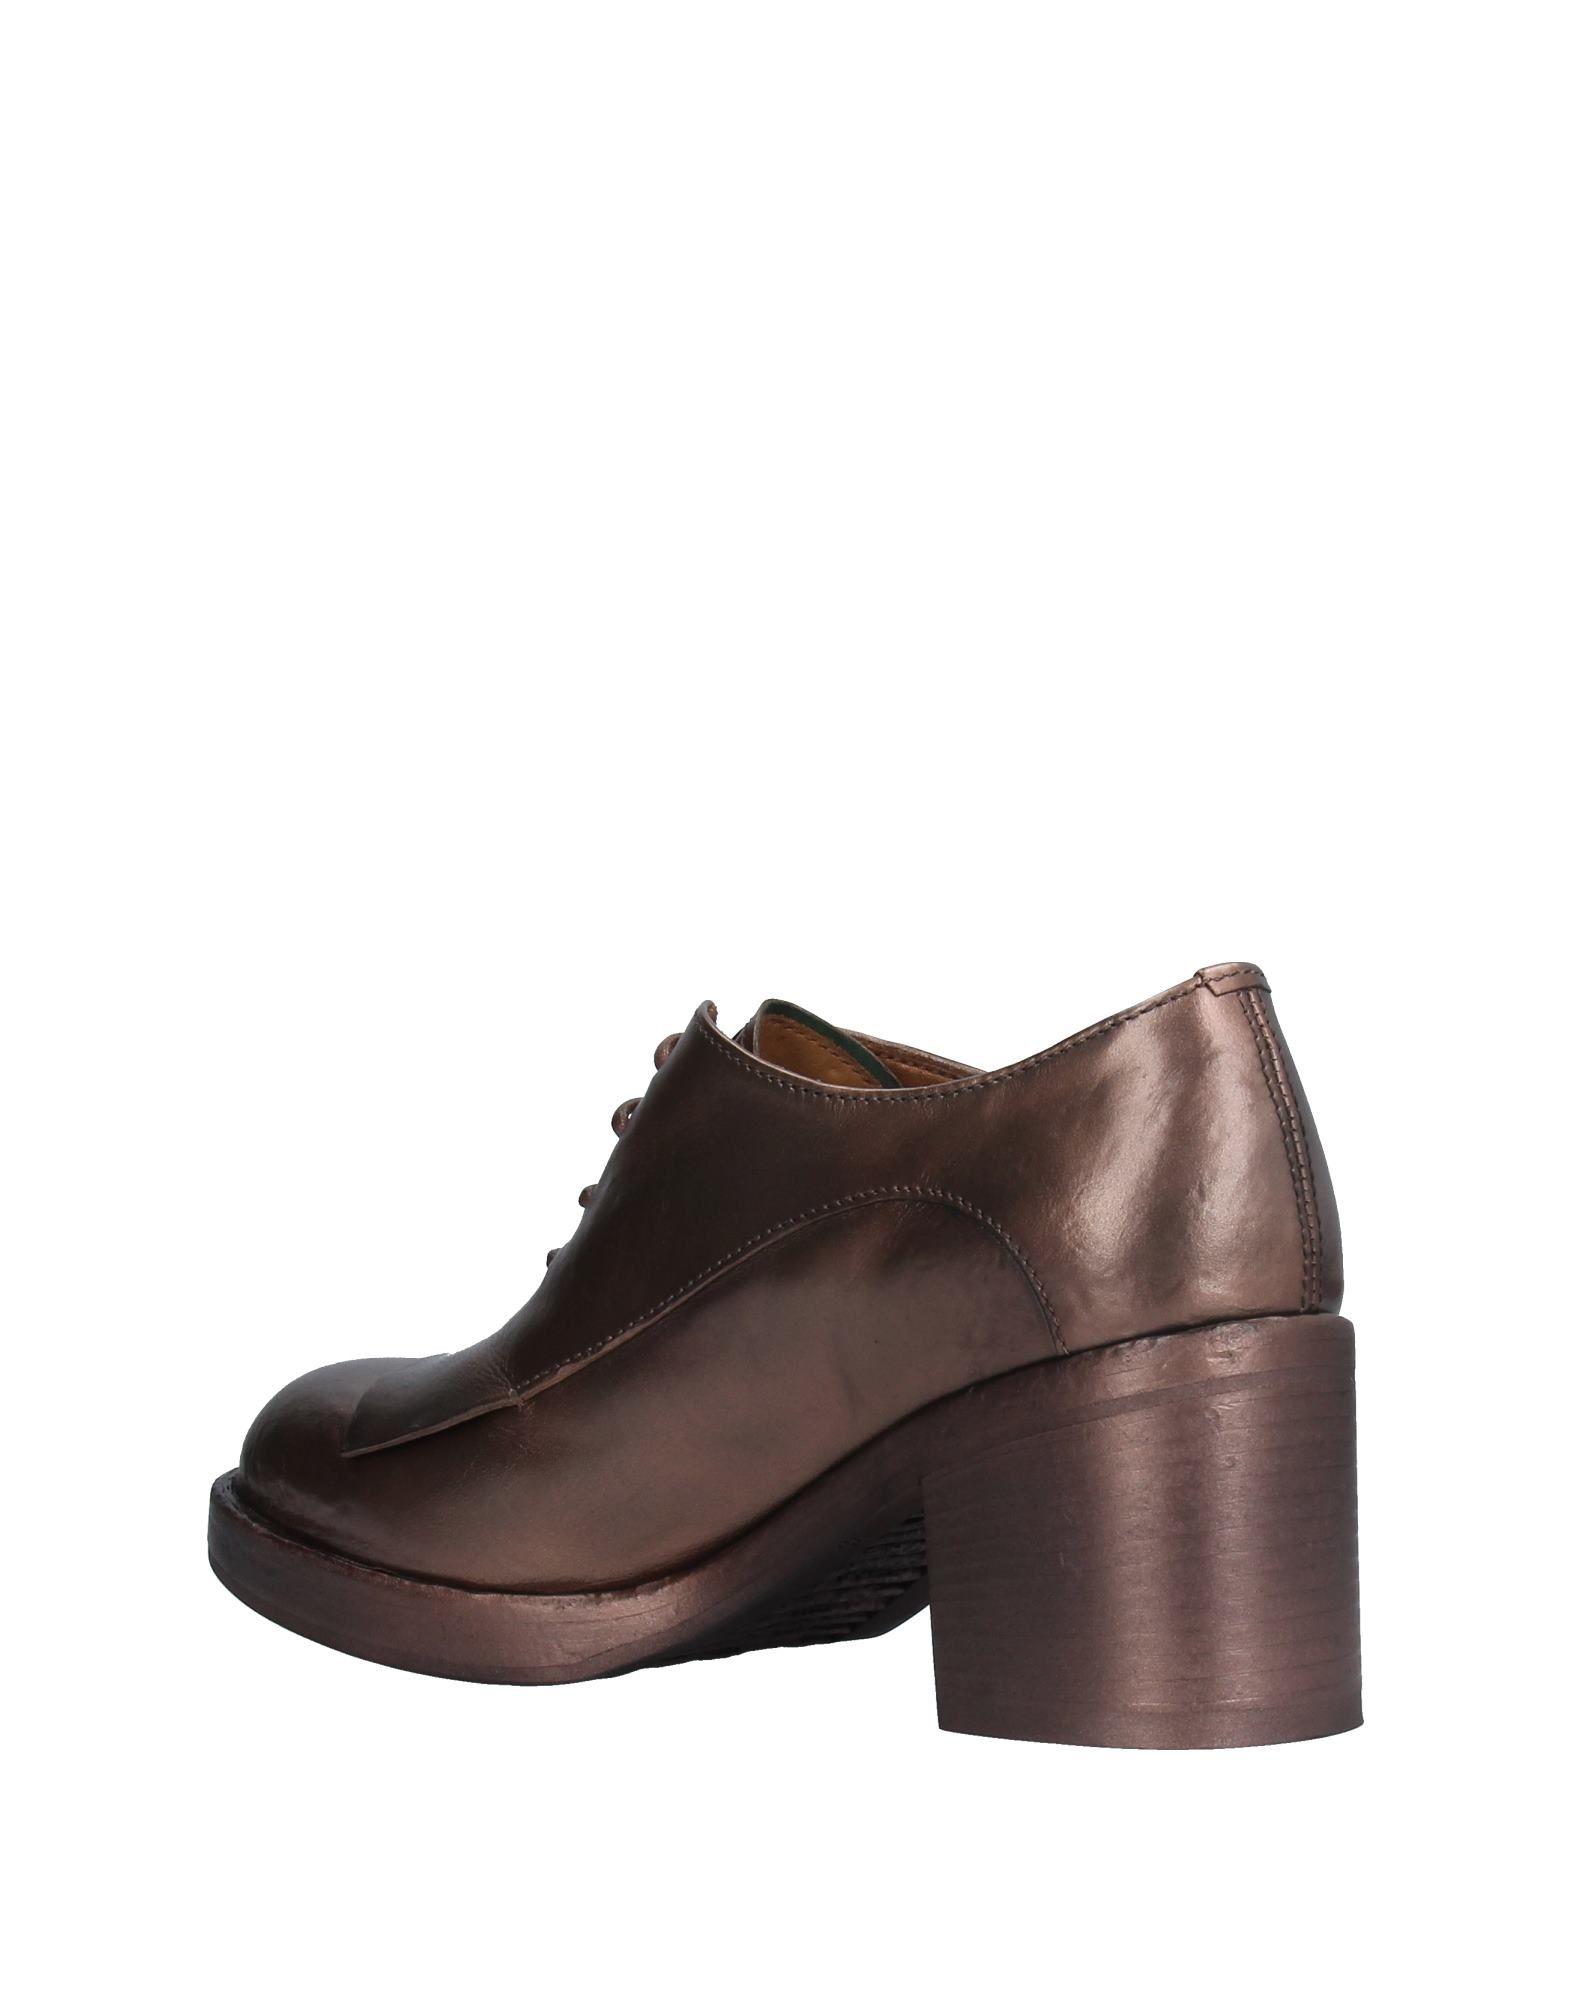 Chaussures - Sandales Post Orteils Officine Creative Italia DAxHSg7QMr